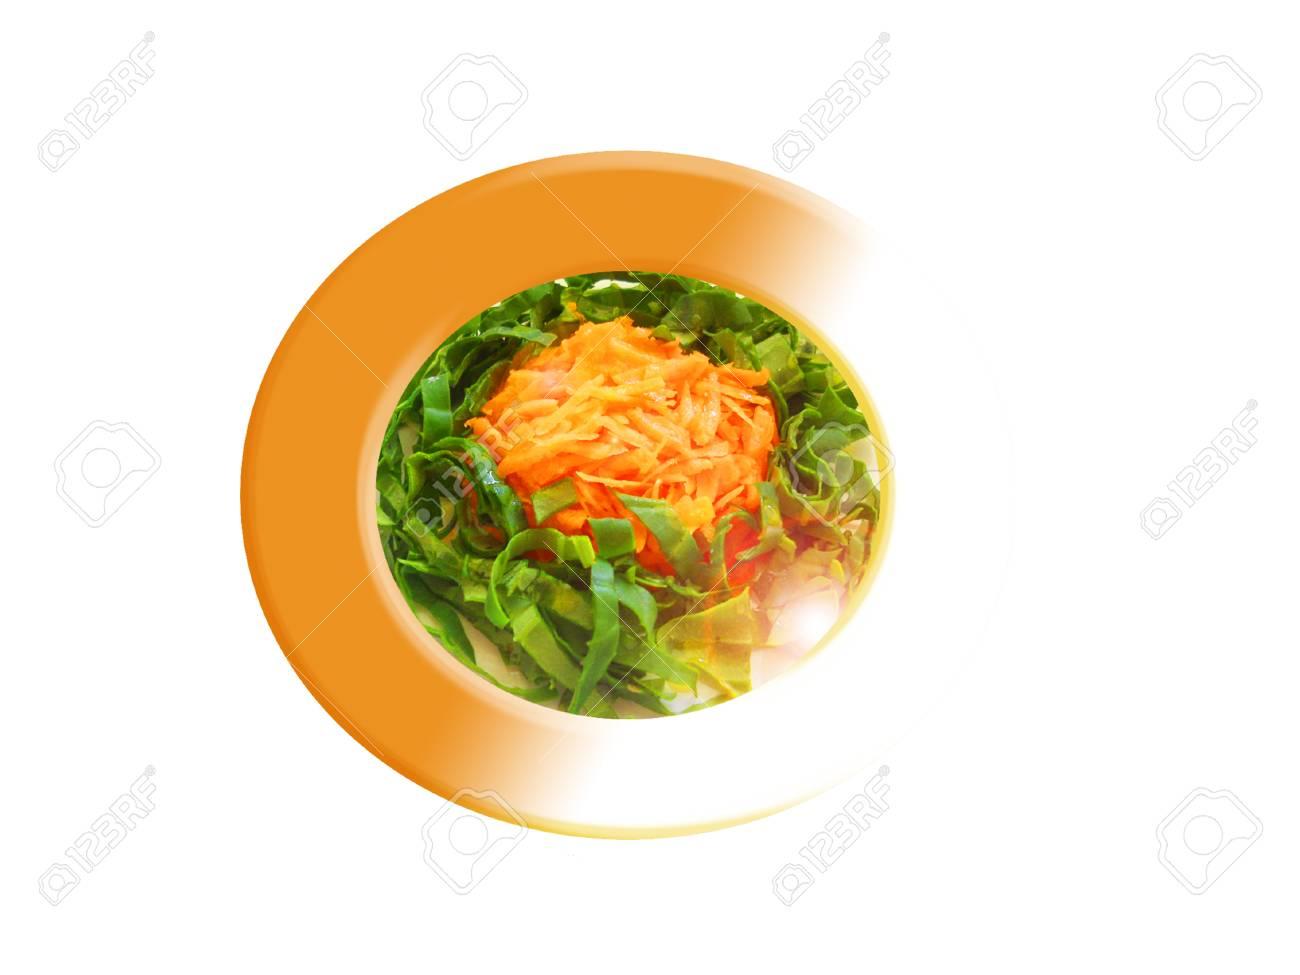 Zanahoria con ensalada de espinacas. Composición. Foto de archivo - 34633292